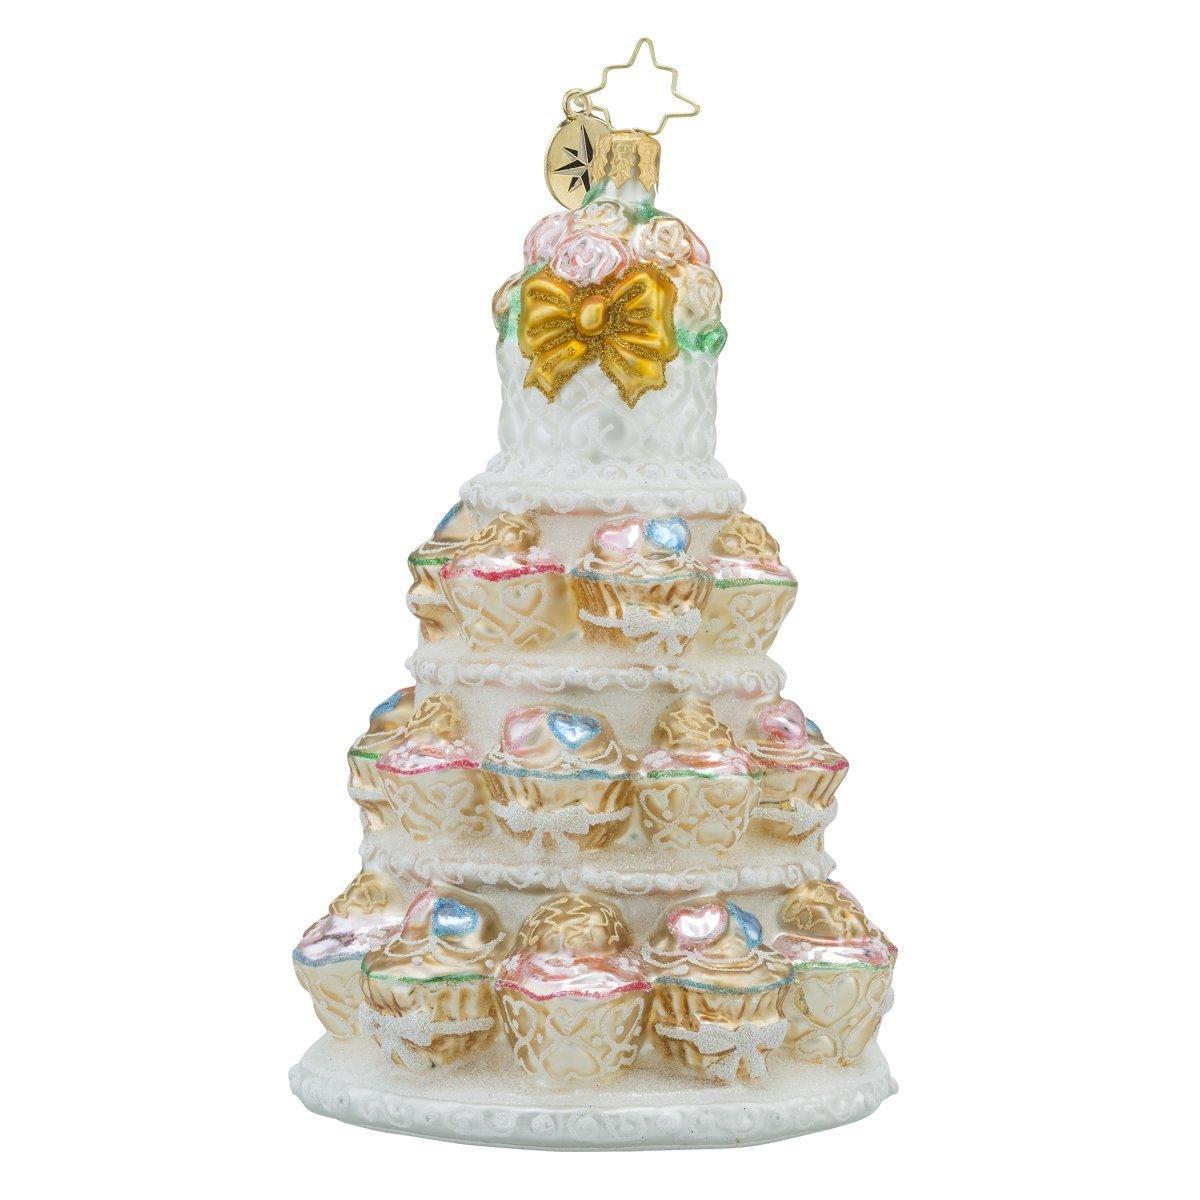 Buy Wedding Cake Ornament in Cheap Price on Alibaba.com